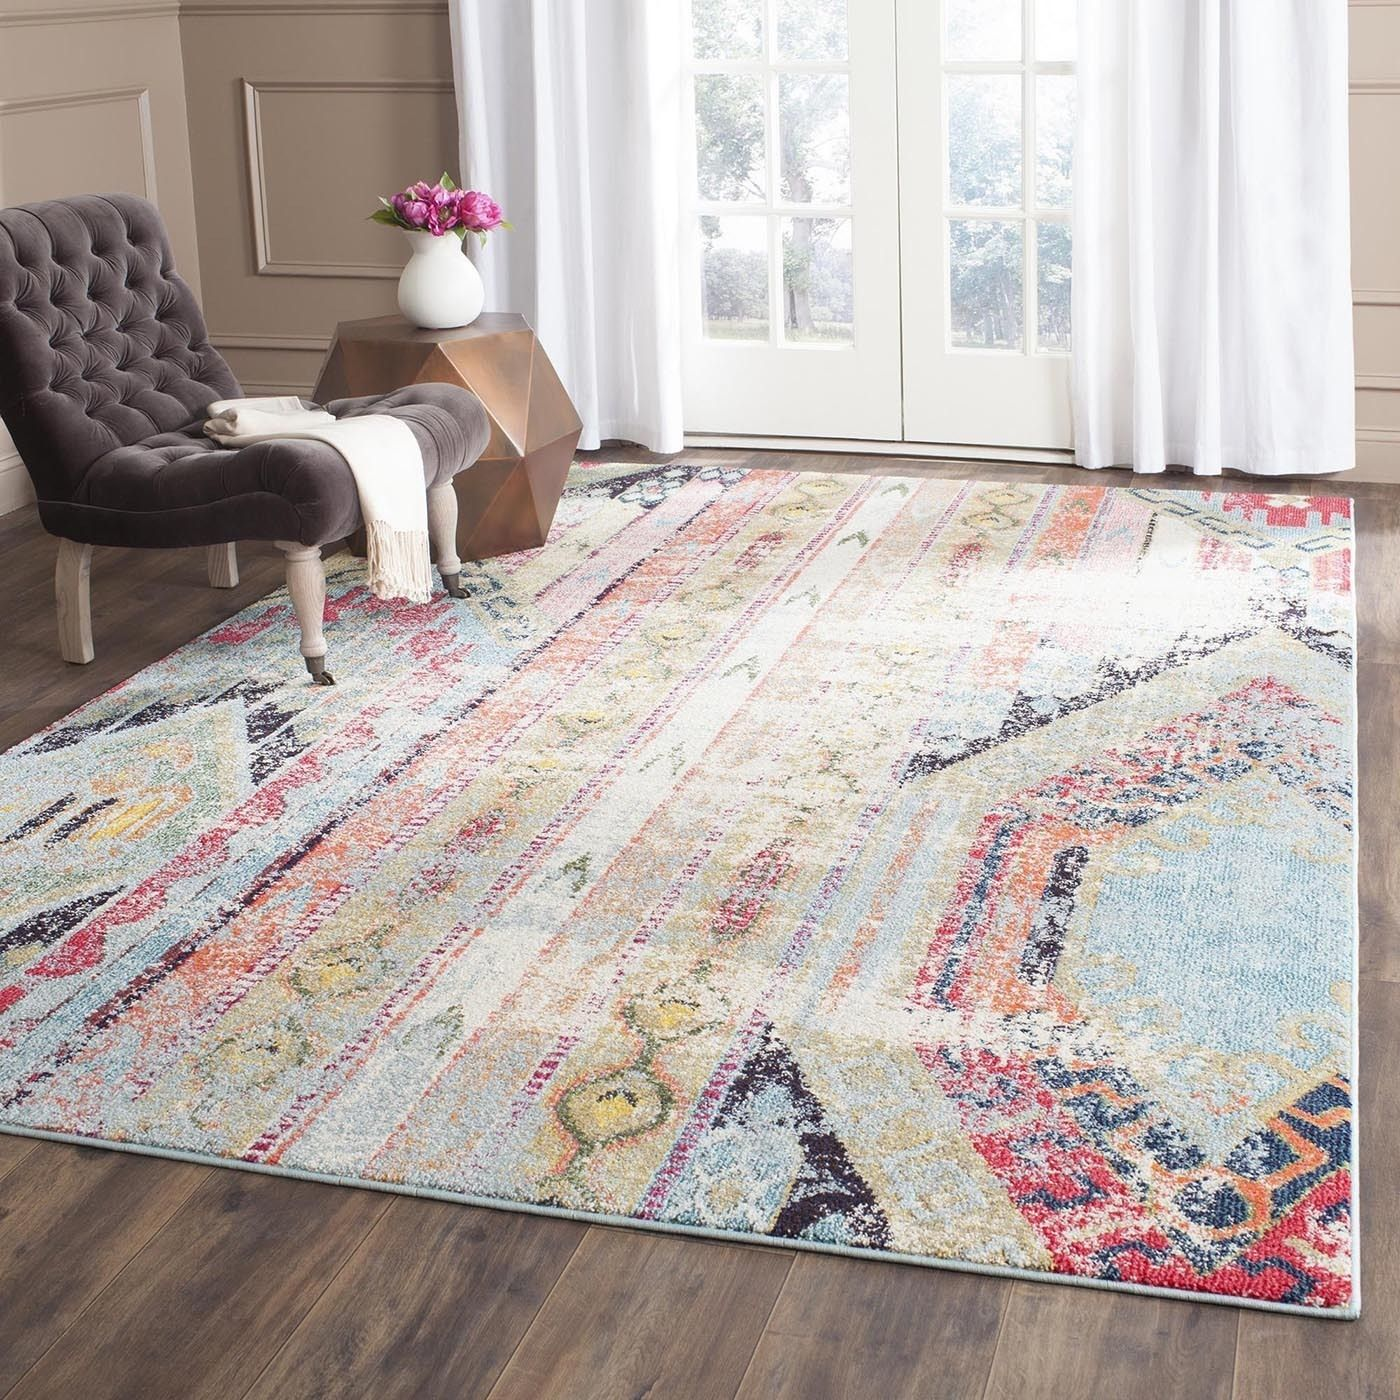 rug for living room size%0A Safavieh Monaco Vintage Bohemian Multicolored Distressed Rug    u      x   u         MNC   F    Multi  Polypropylene  Abstract